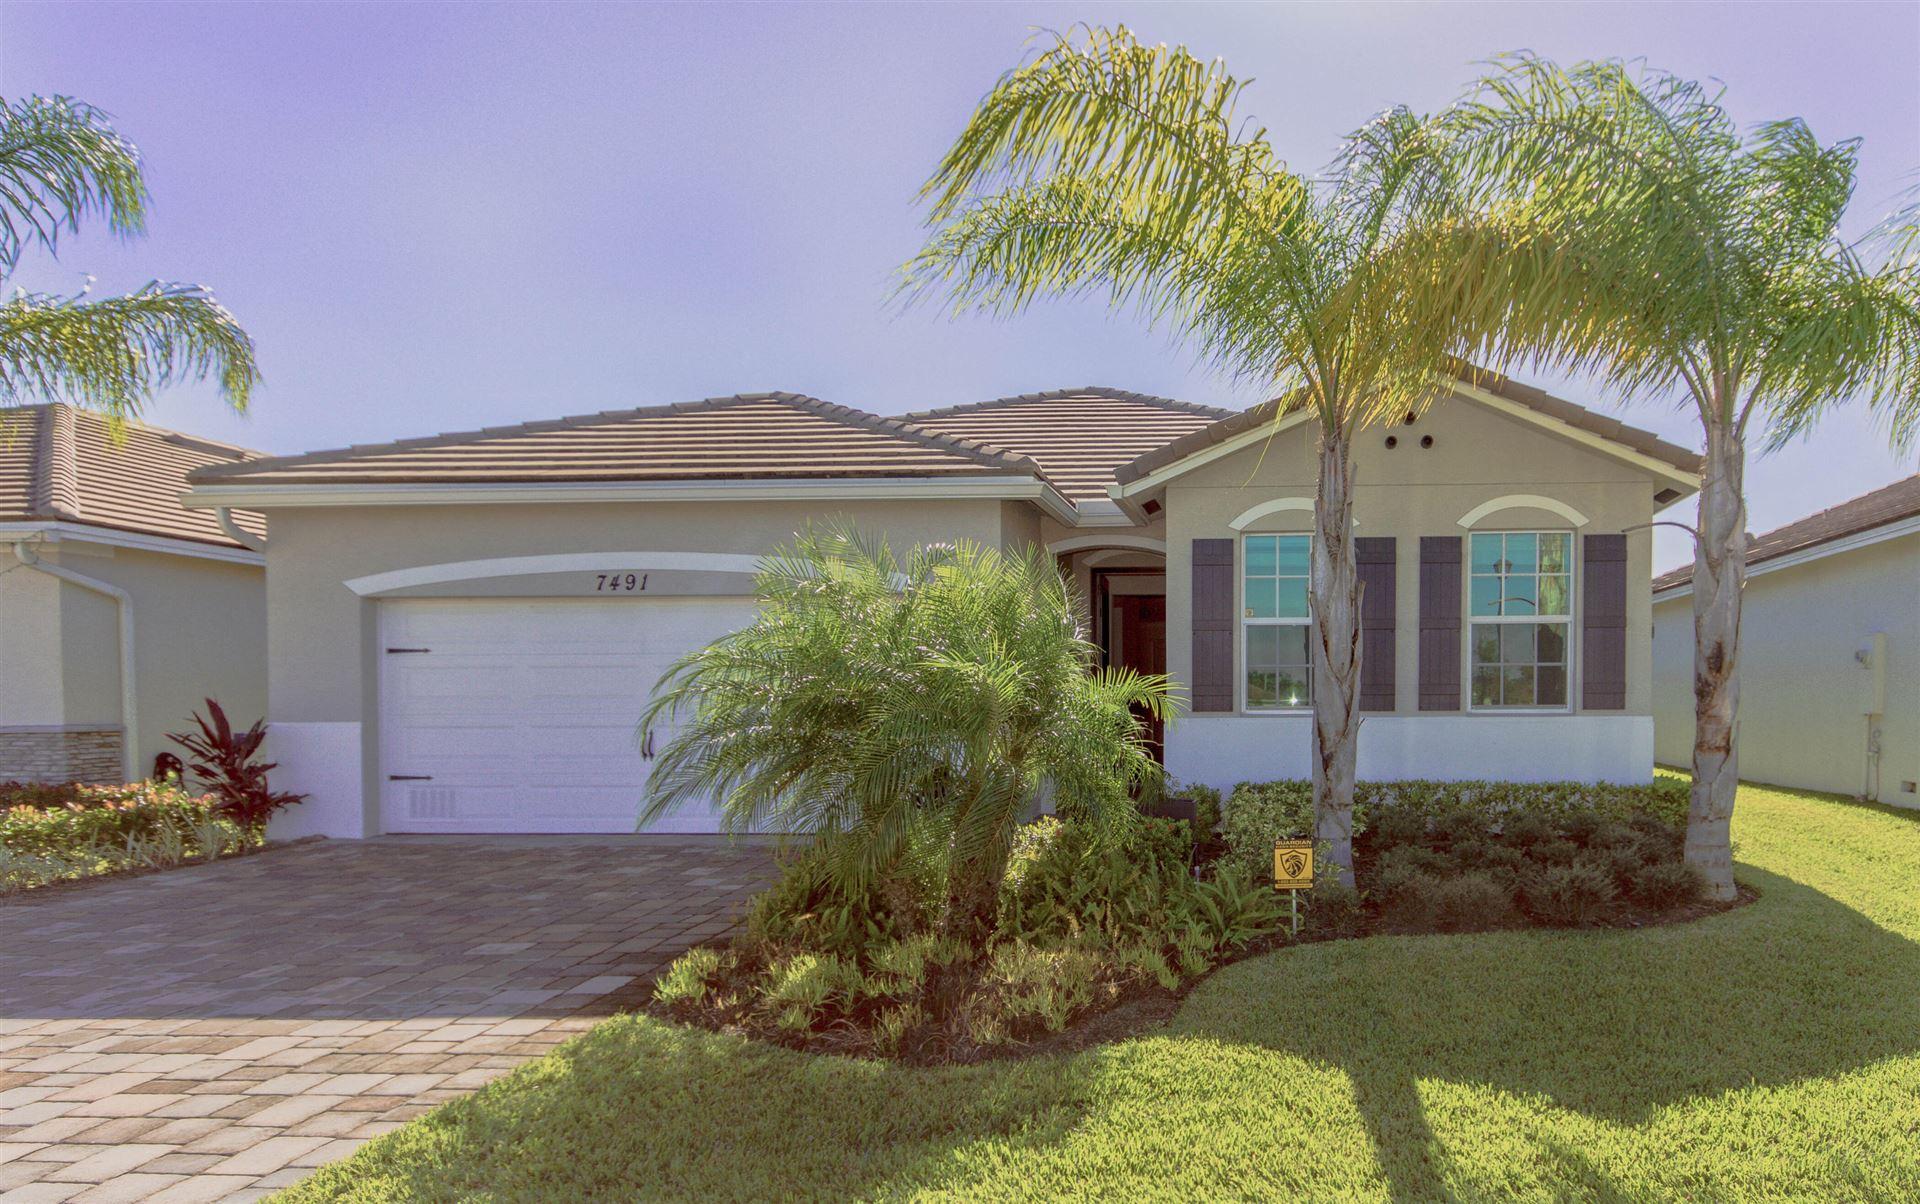 7491 SW Harbor Cove Drive, Stuart, FL 34997 - #: RX-10679065